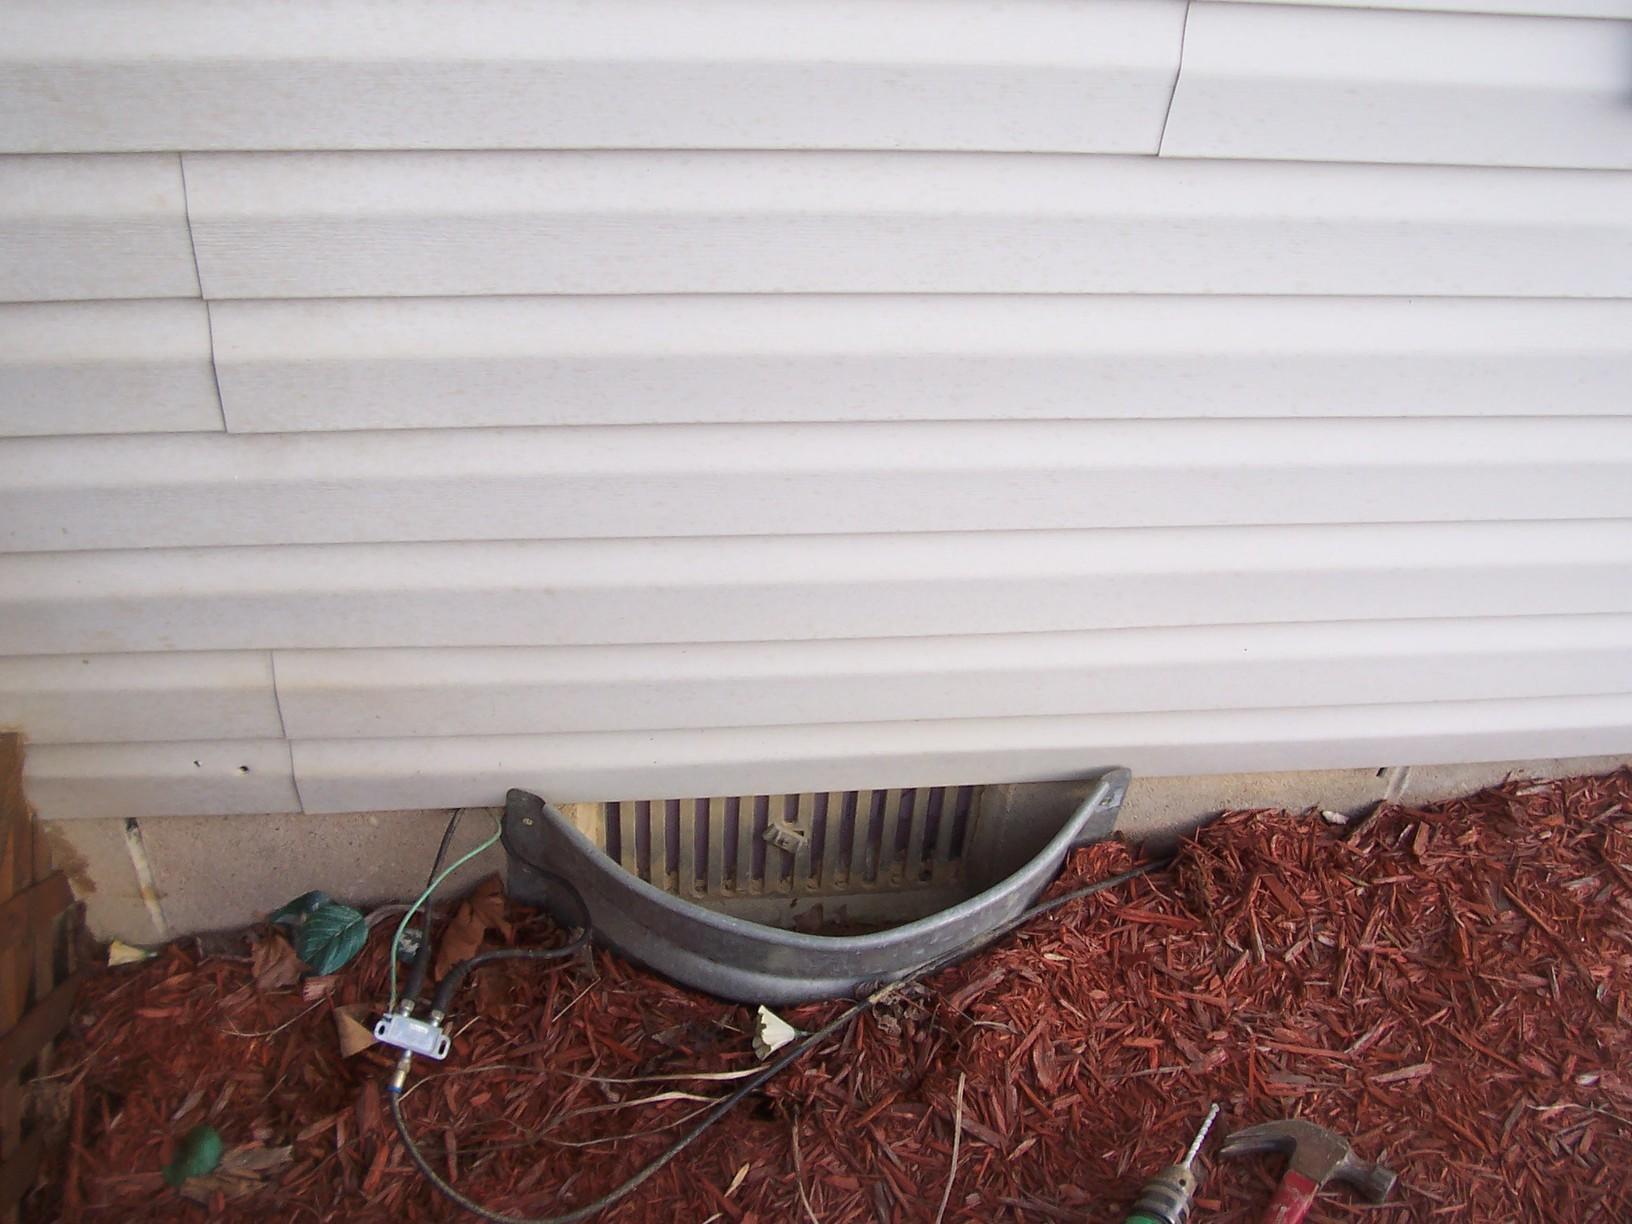 EverLast Door Seals Crawl Space in Lost Creek, WV. - Before Photo